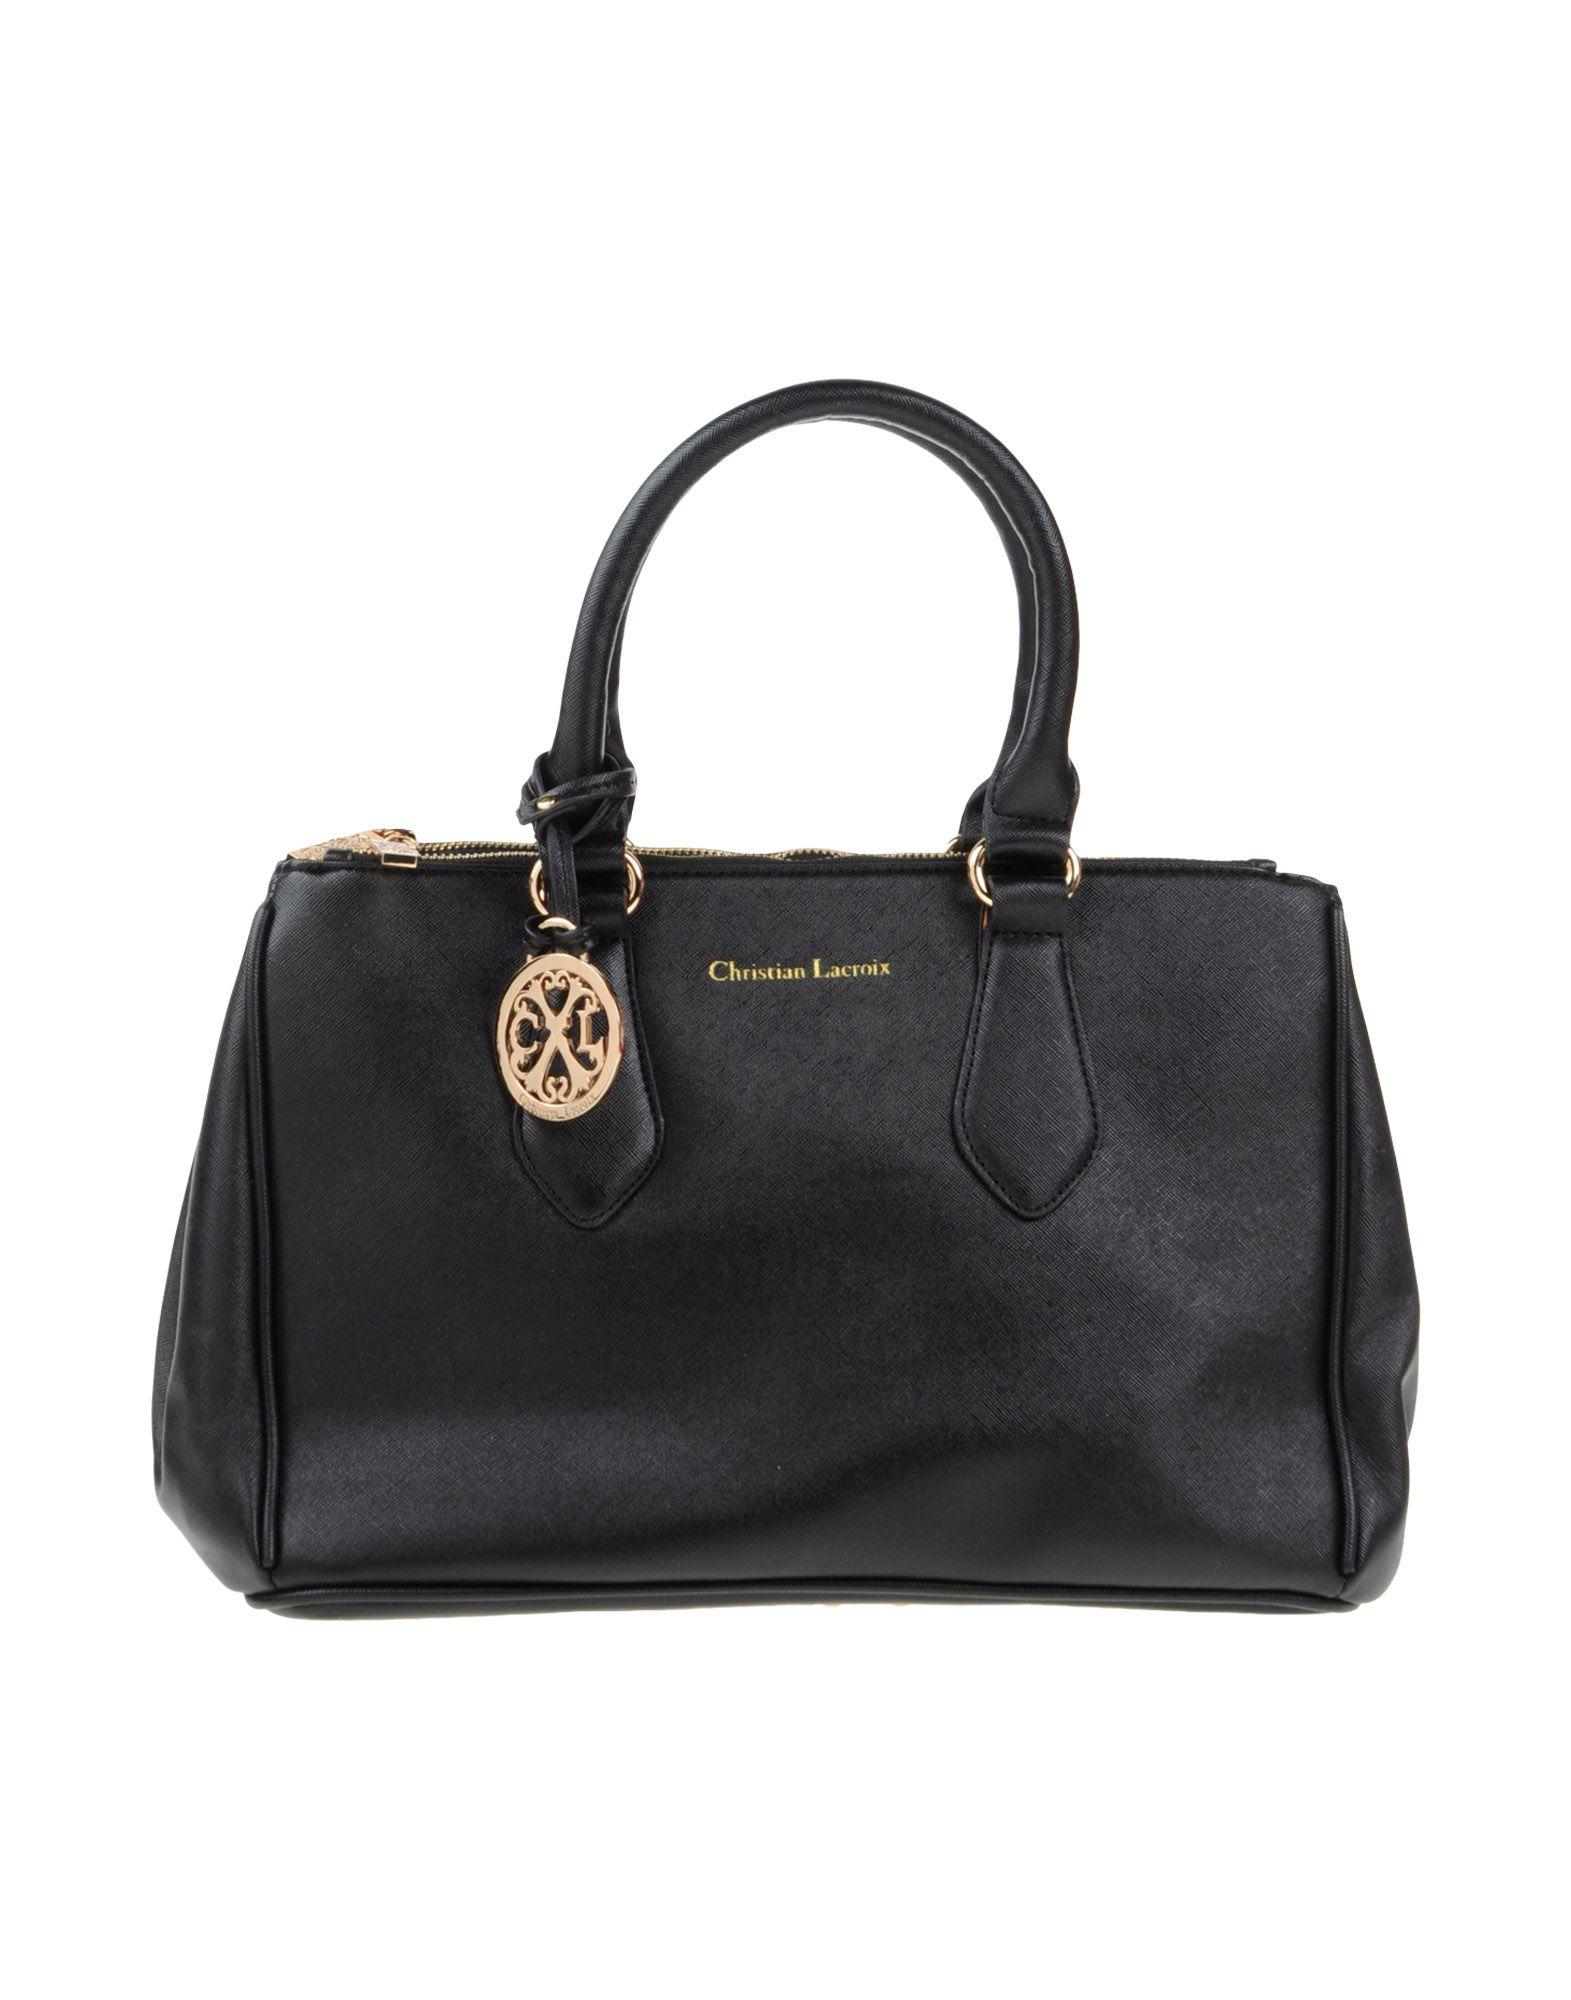 2876693a7 Christian Lacroix Handbag in Black - Lyst